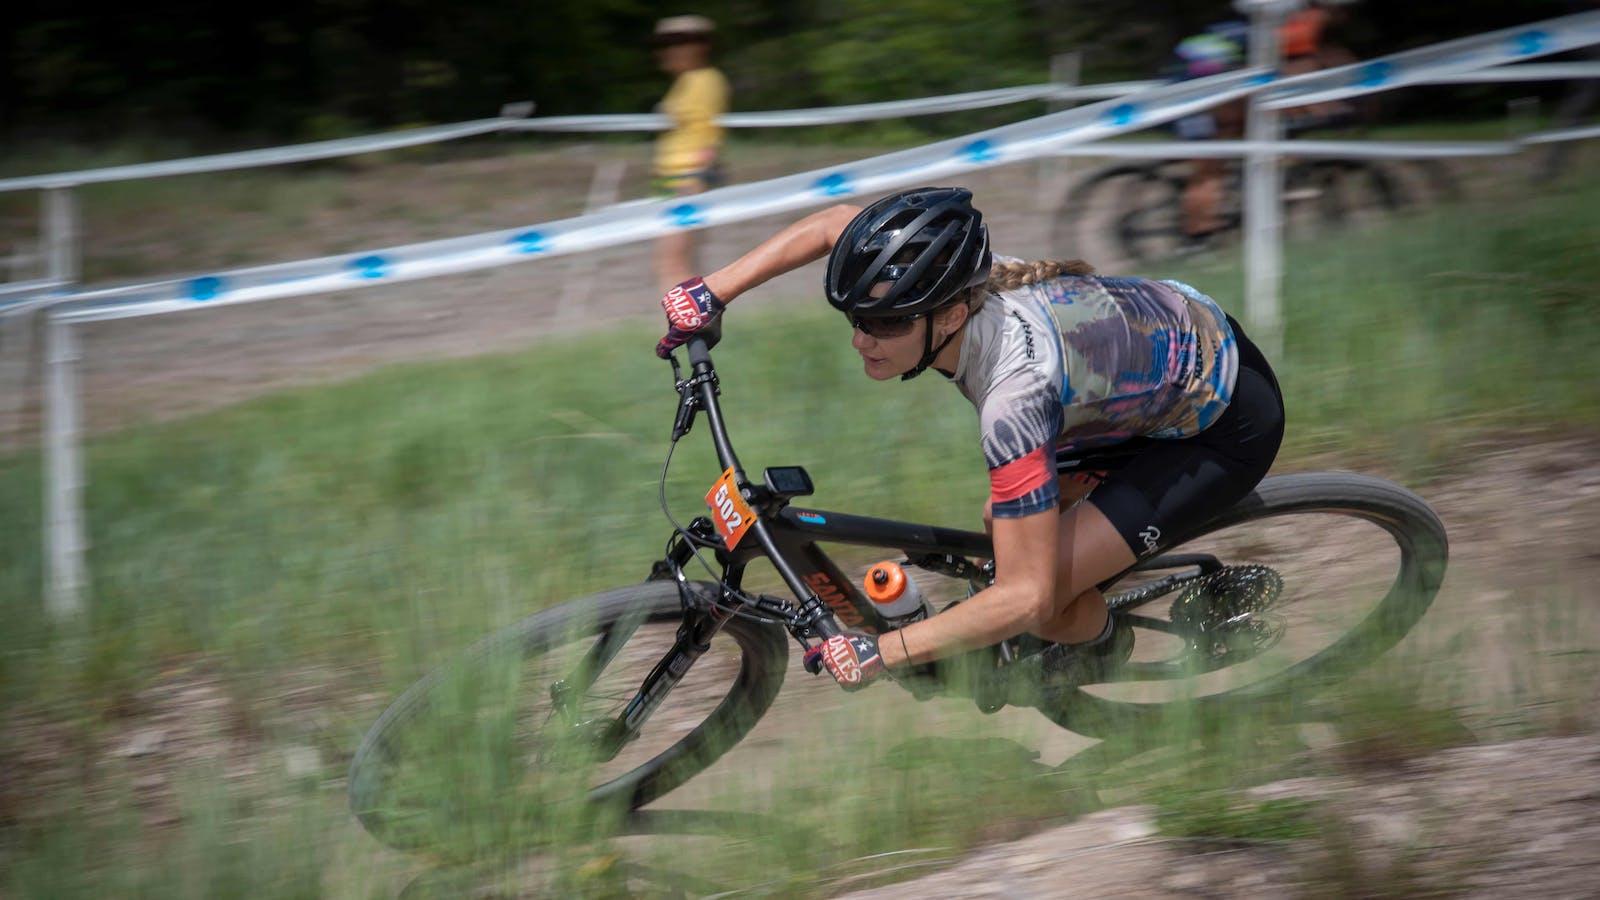 Alexis Skarda racing XC in Montana